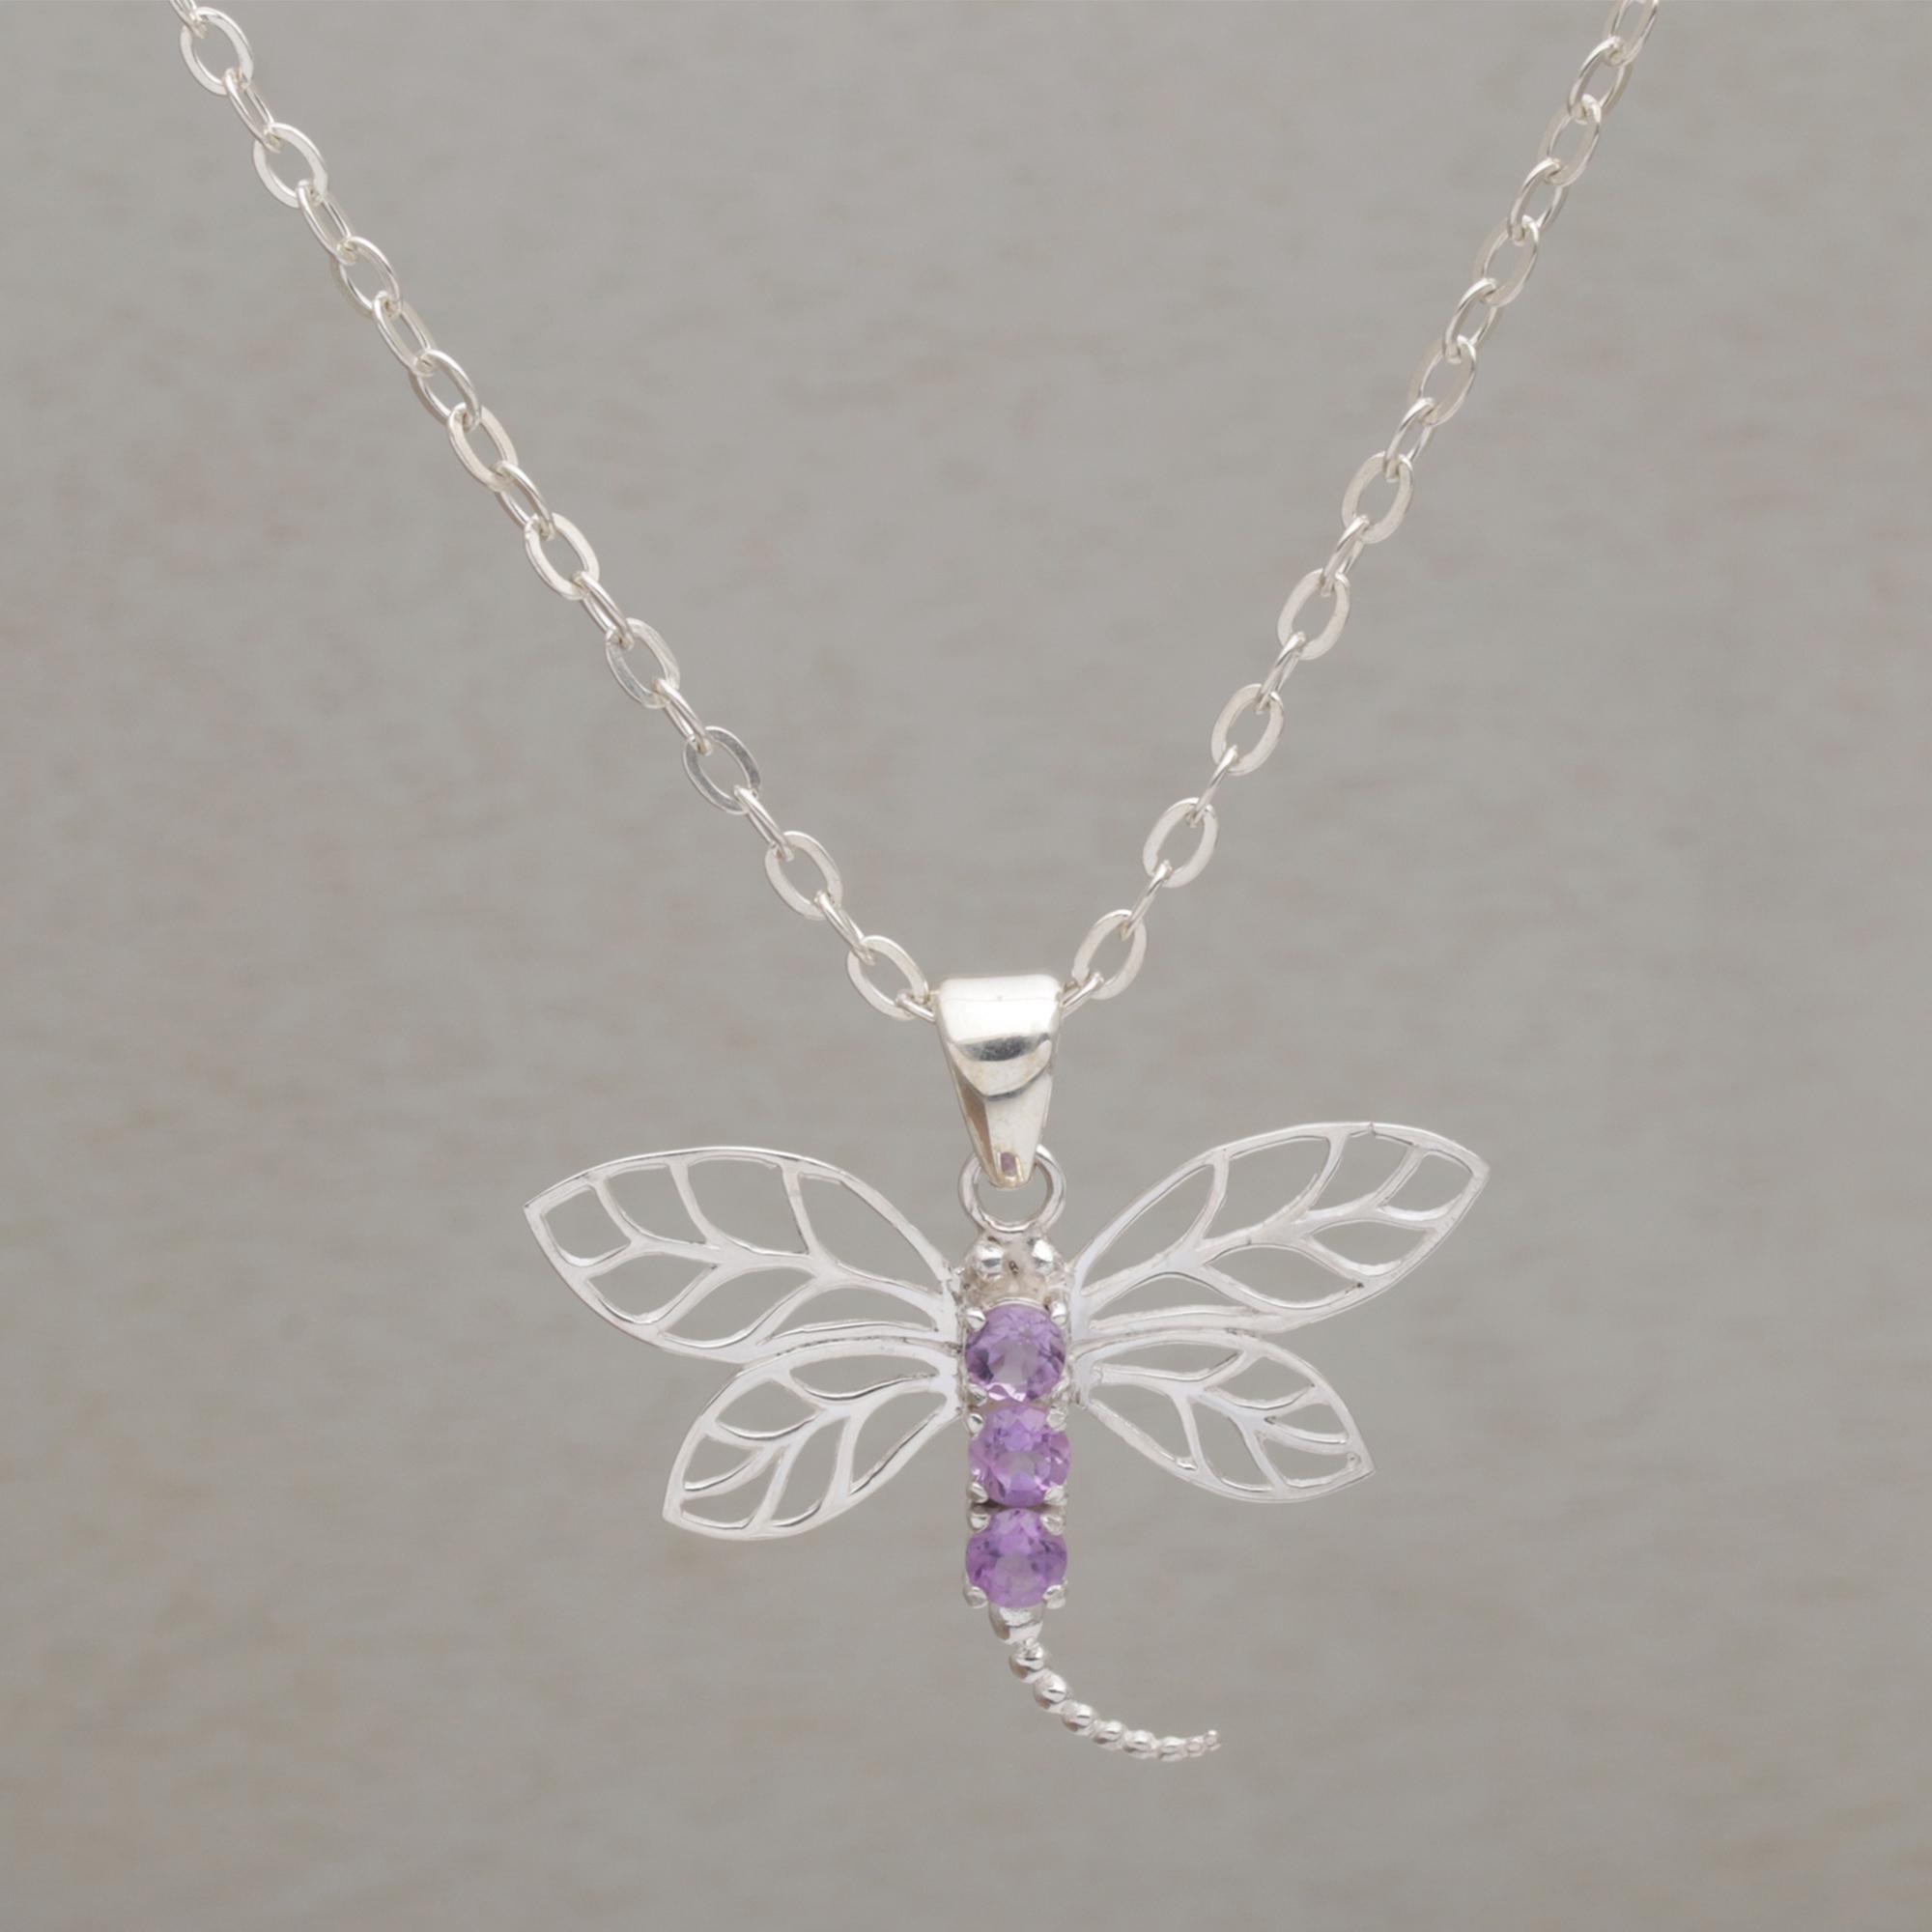 5e742b998 UNICEF Market   925 Sterling Silver Amethyst Dragonfly Pendant ...